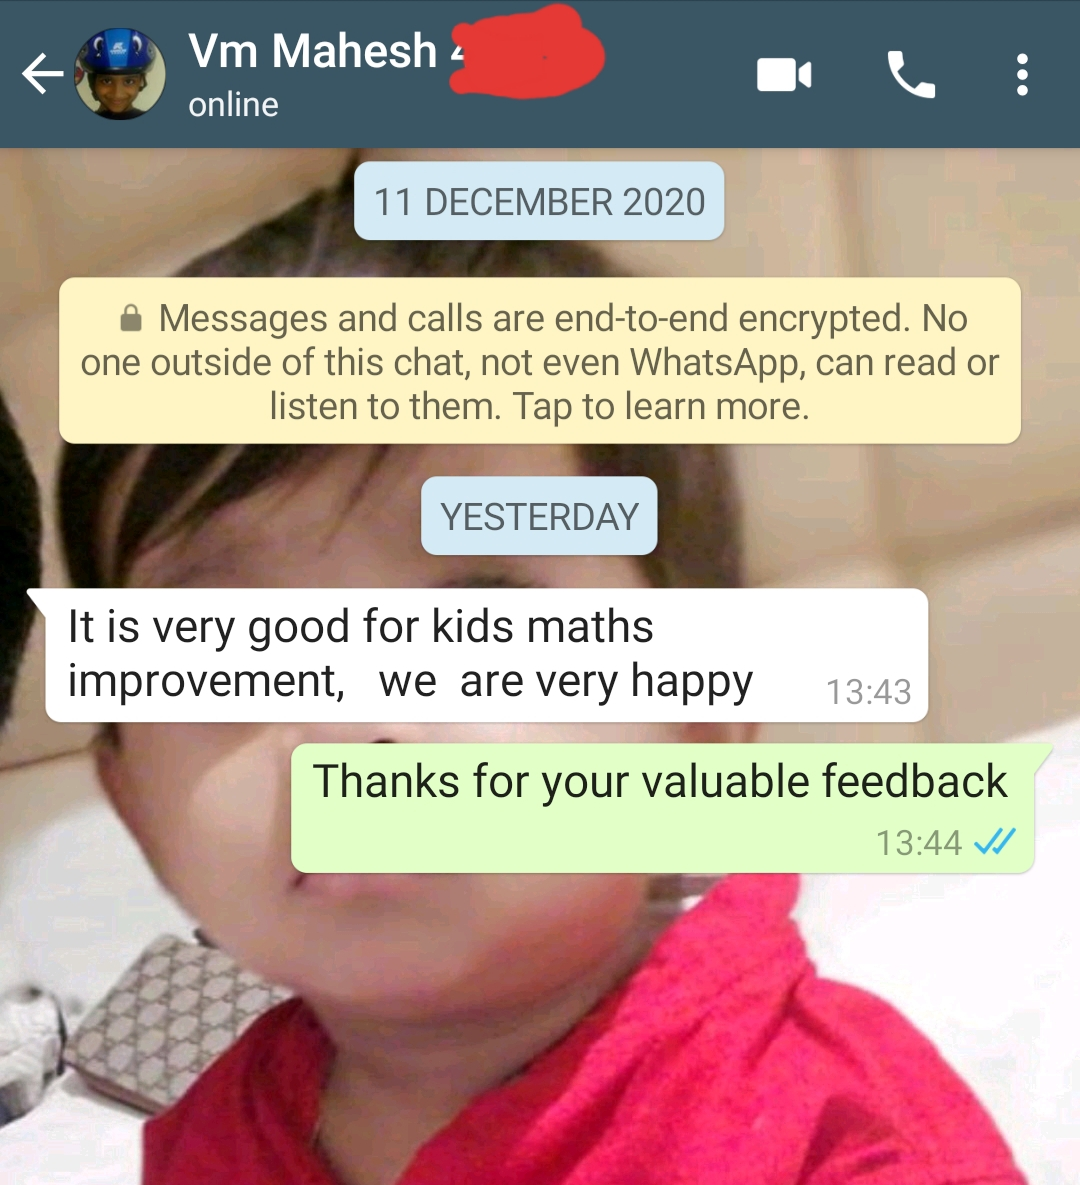 WhatsApp-Image-2020-12-25-at-6.16.57-PM